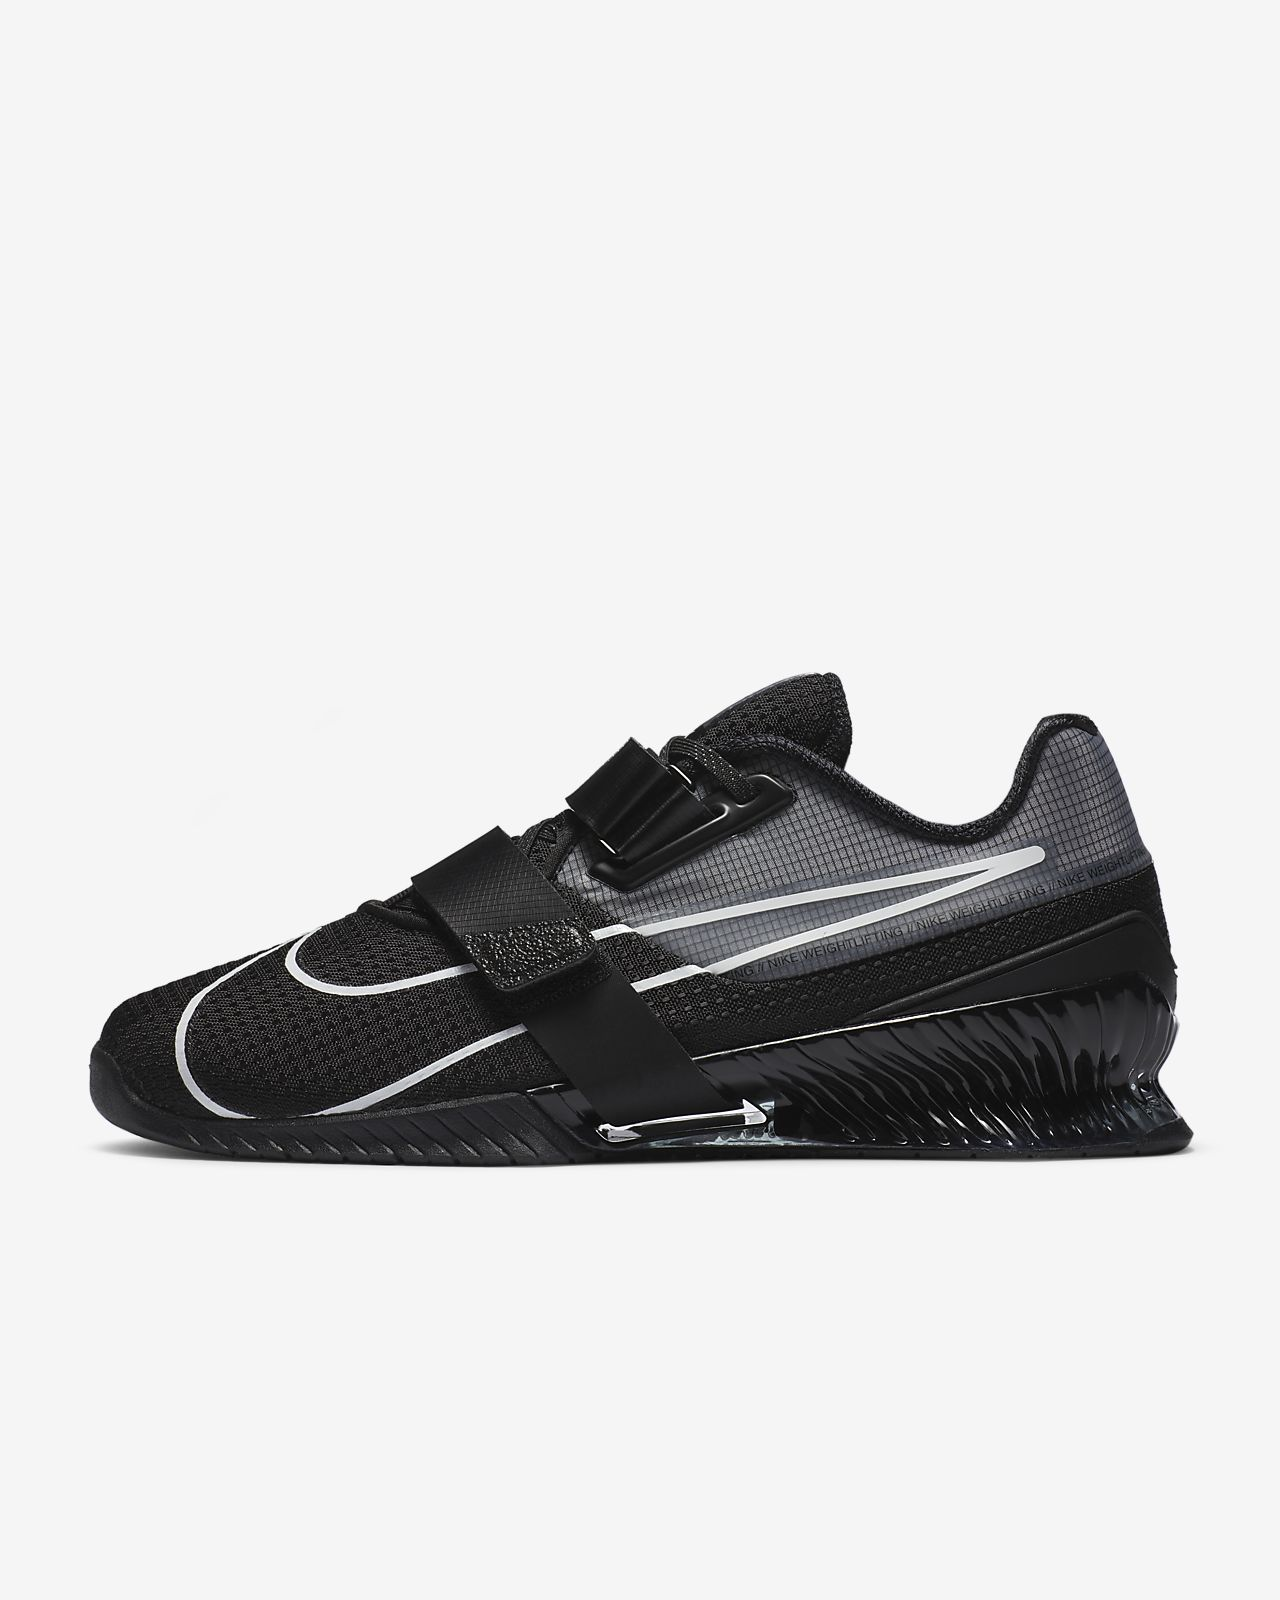 Chaussure de training Nike Romaleos 4